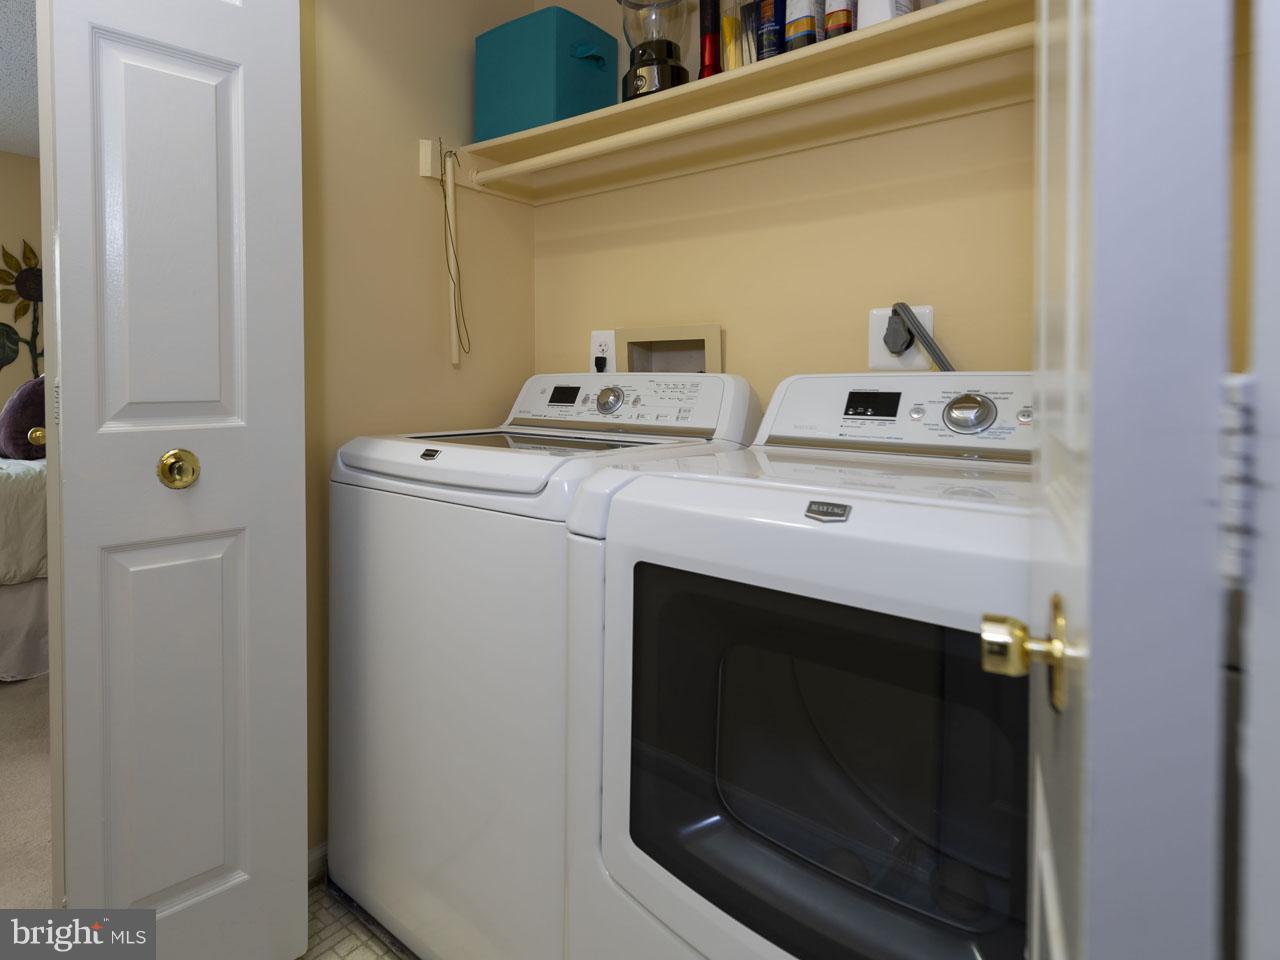 1002640508-300537943094-2021-07-22-05-00-36     Pinecrest   Alexandria Delaware Real Estate For Sale   MLS# 1002640508  - Best of Northern Virginia